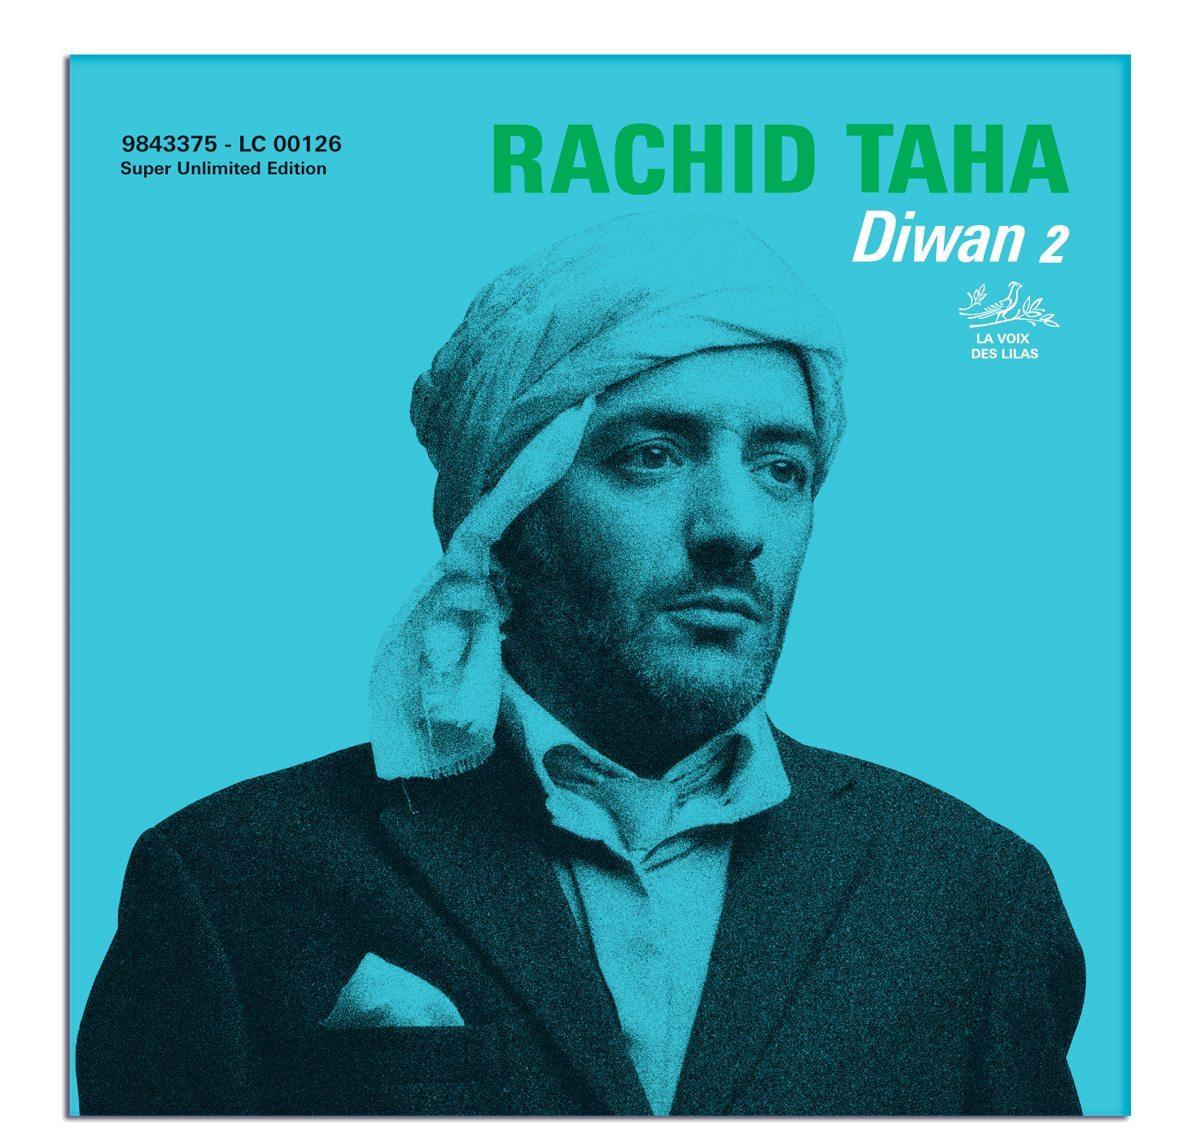 Rachid-TAHA-Diwan-2-ichetkar